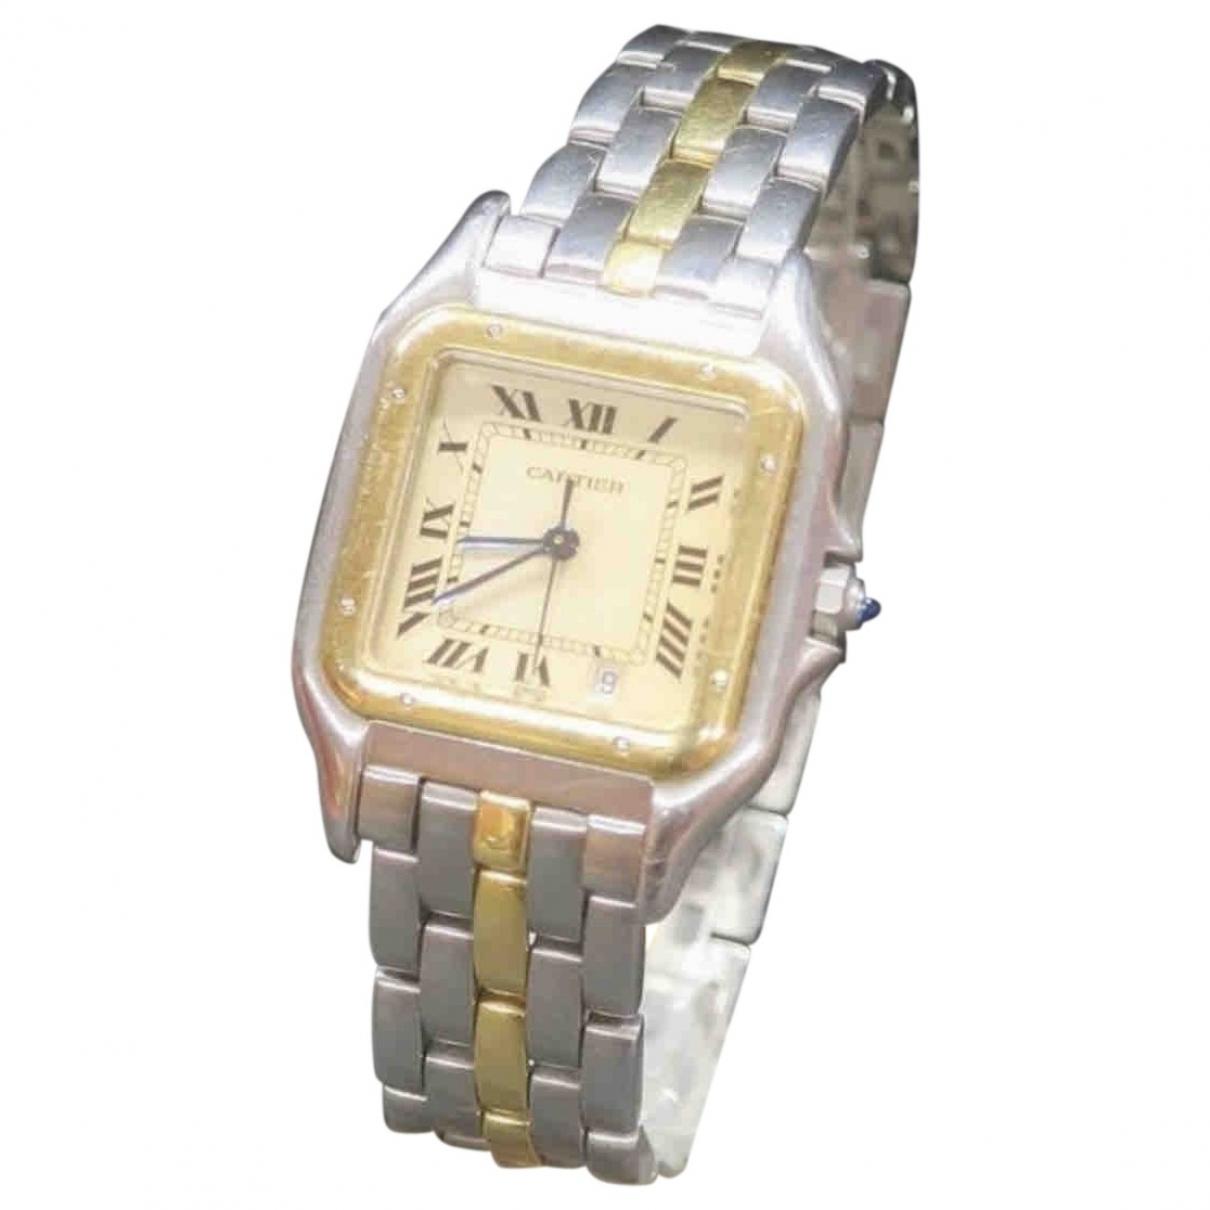 Reloj Panthere de Oro amarillo Cartier